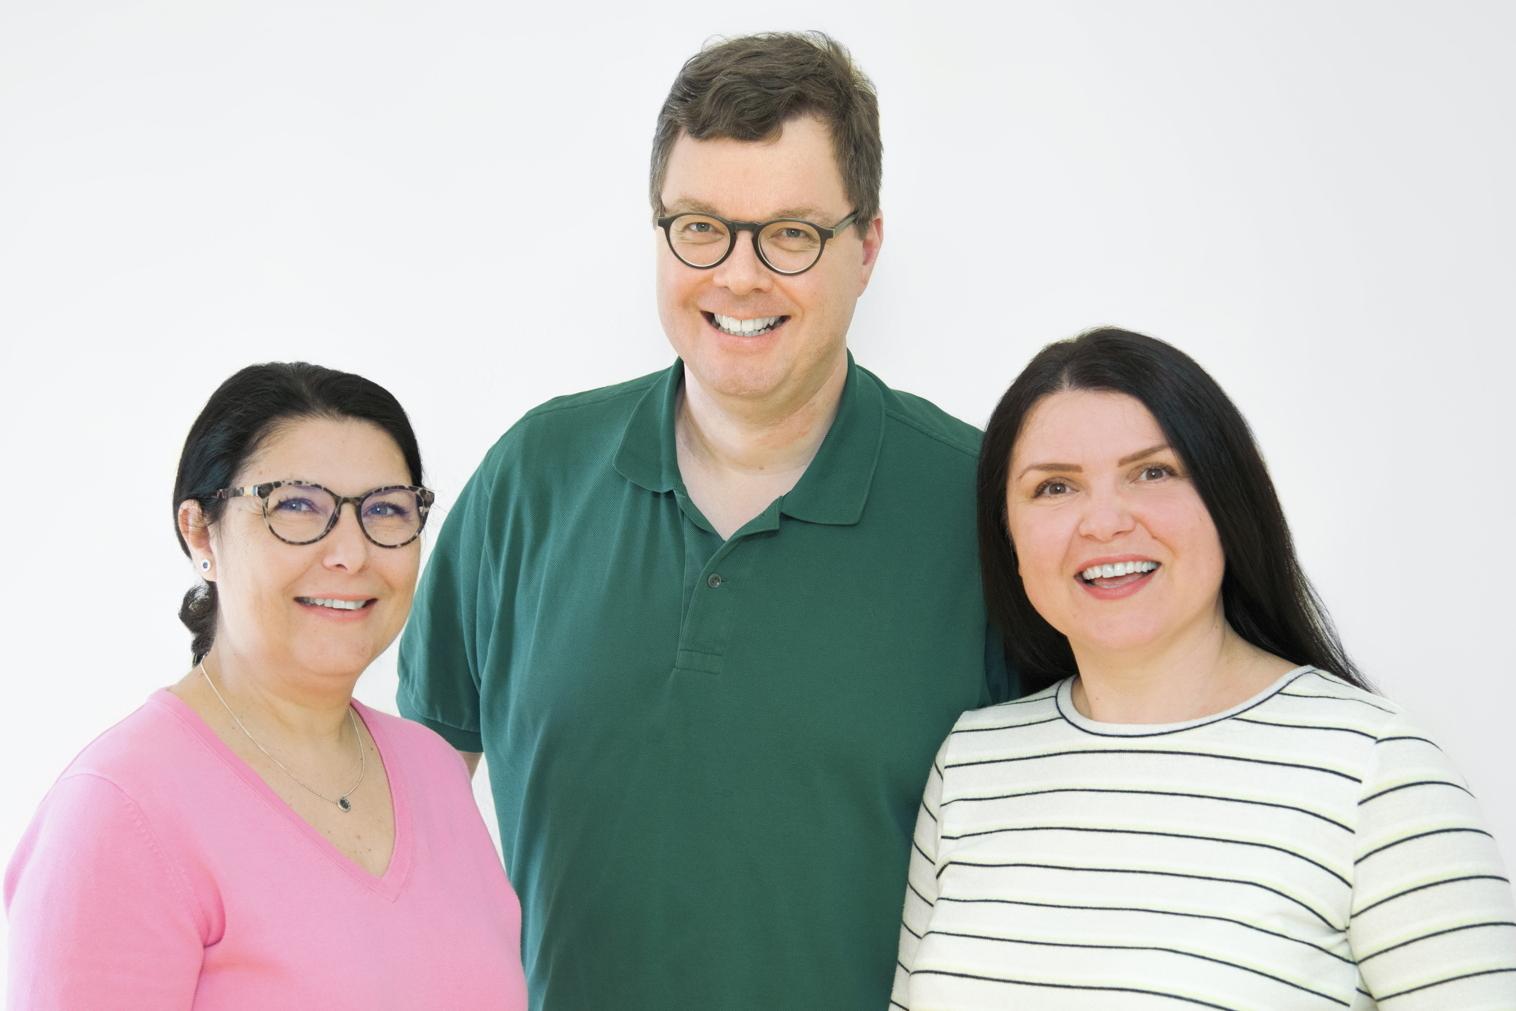 Praxisteam Hausarztpraxis am Rathausplatz